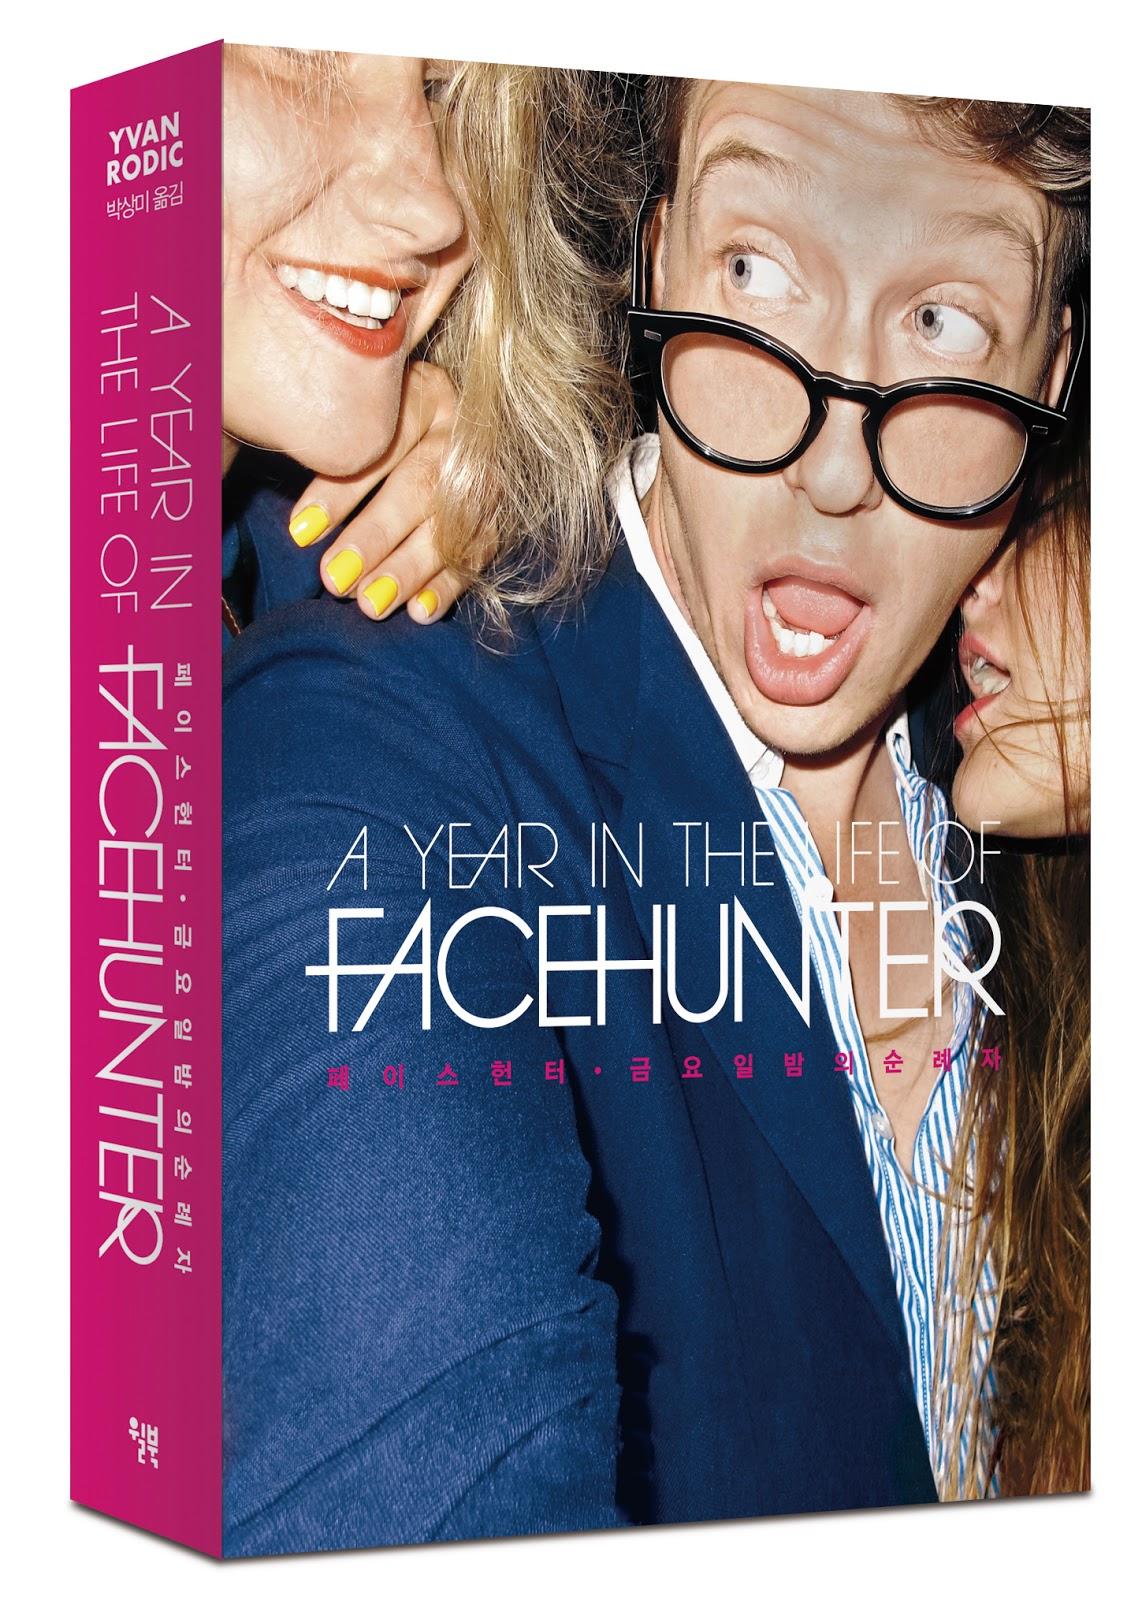 pics Facehunter: The Book